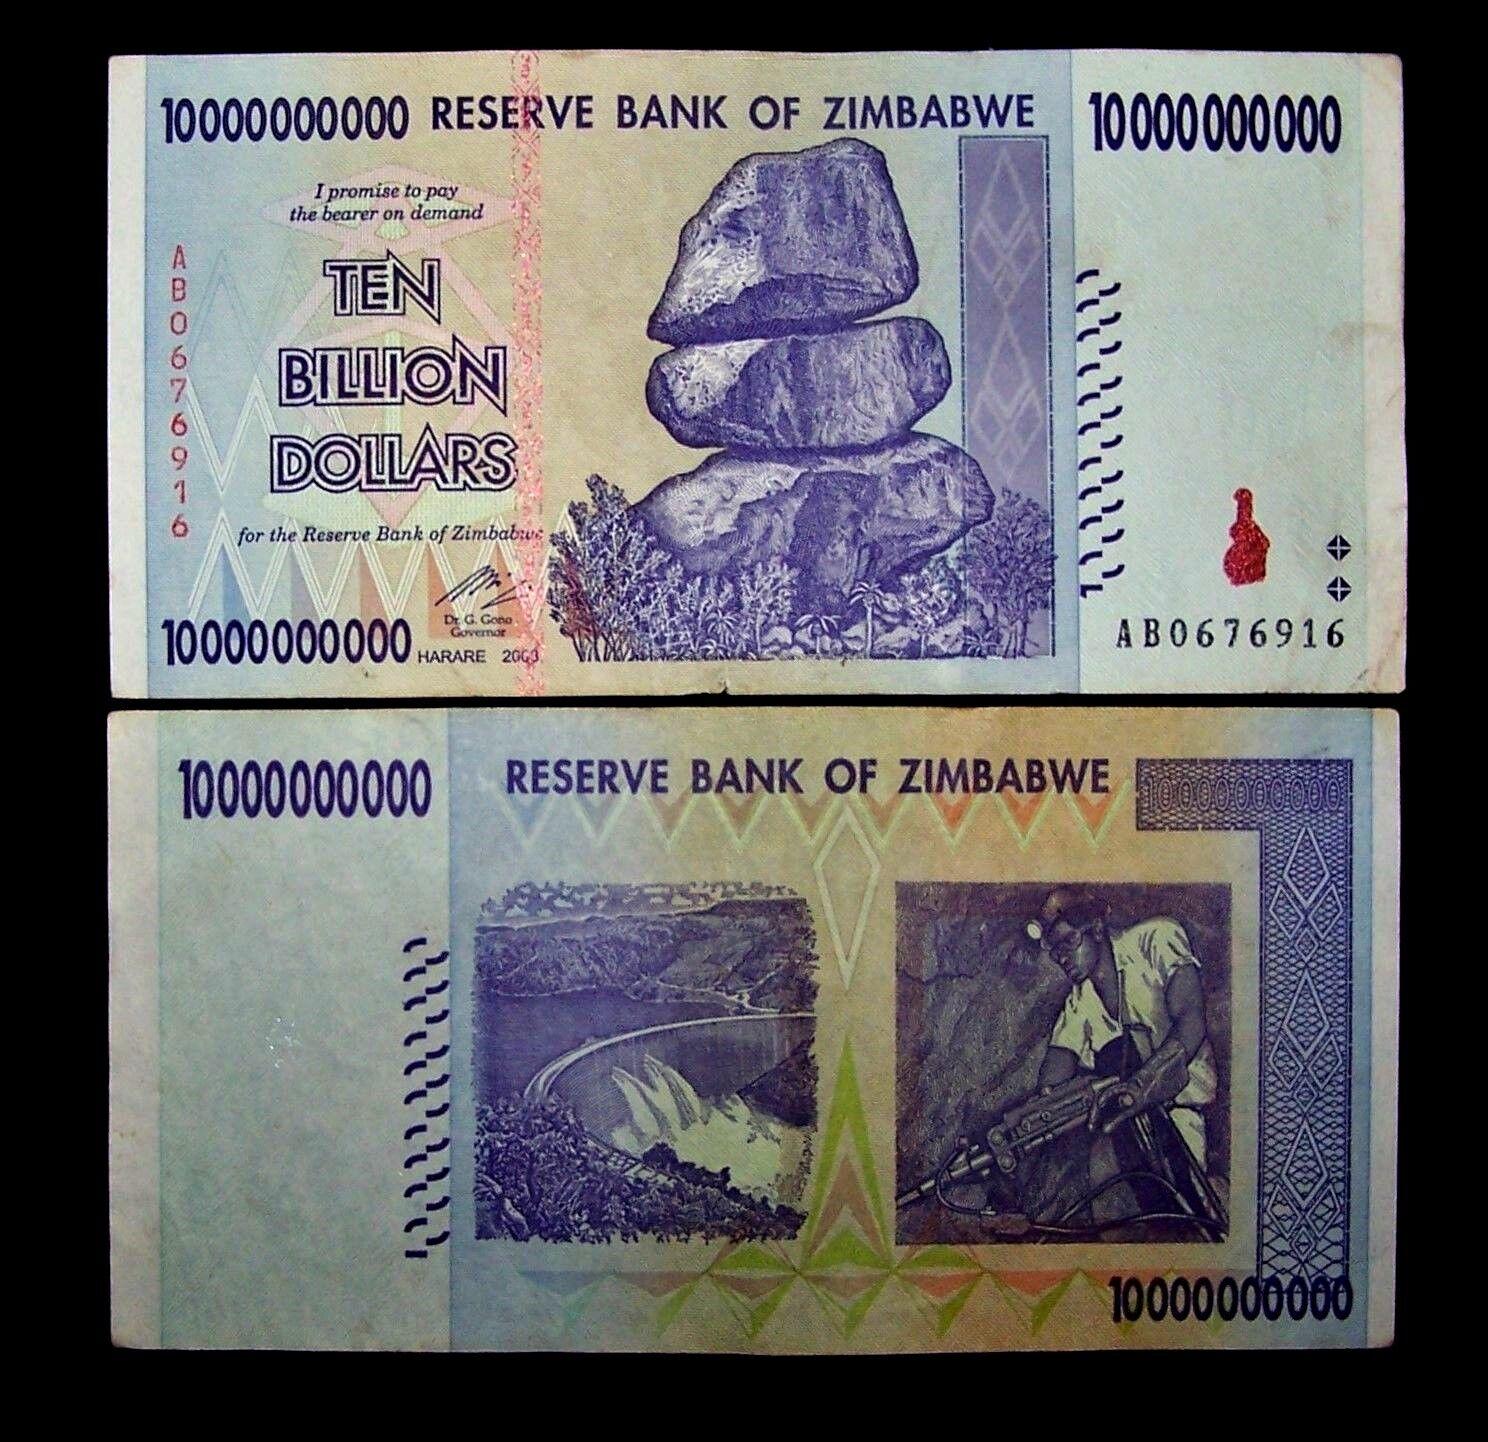 1 x Zimbabwe 10 Billion Dollar banknote -paper money currency